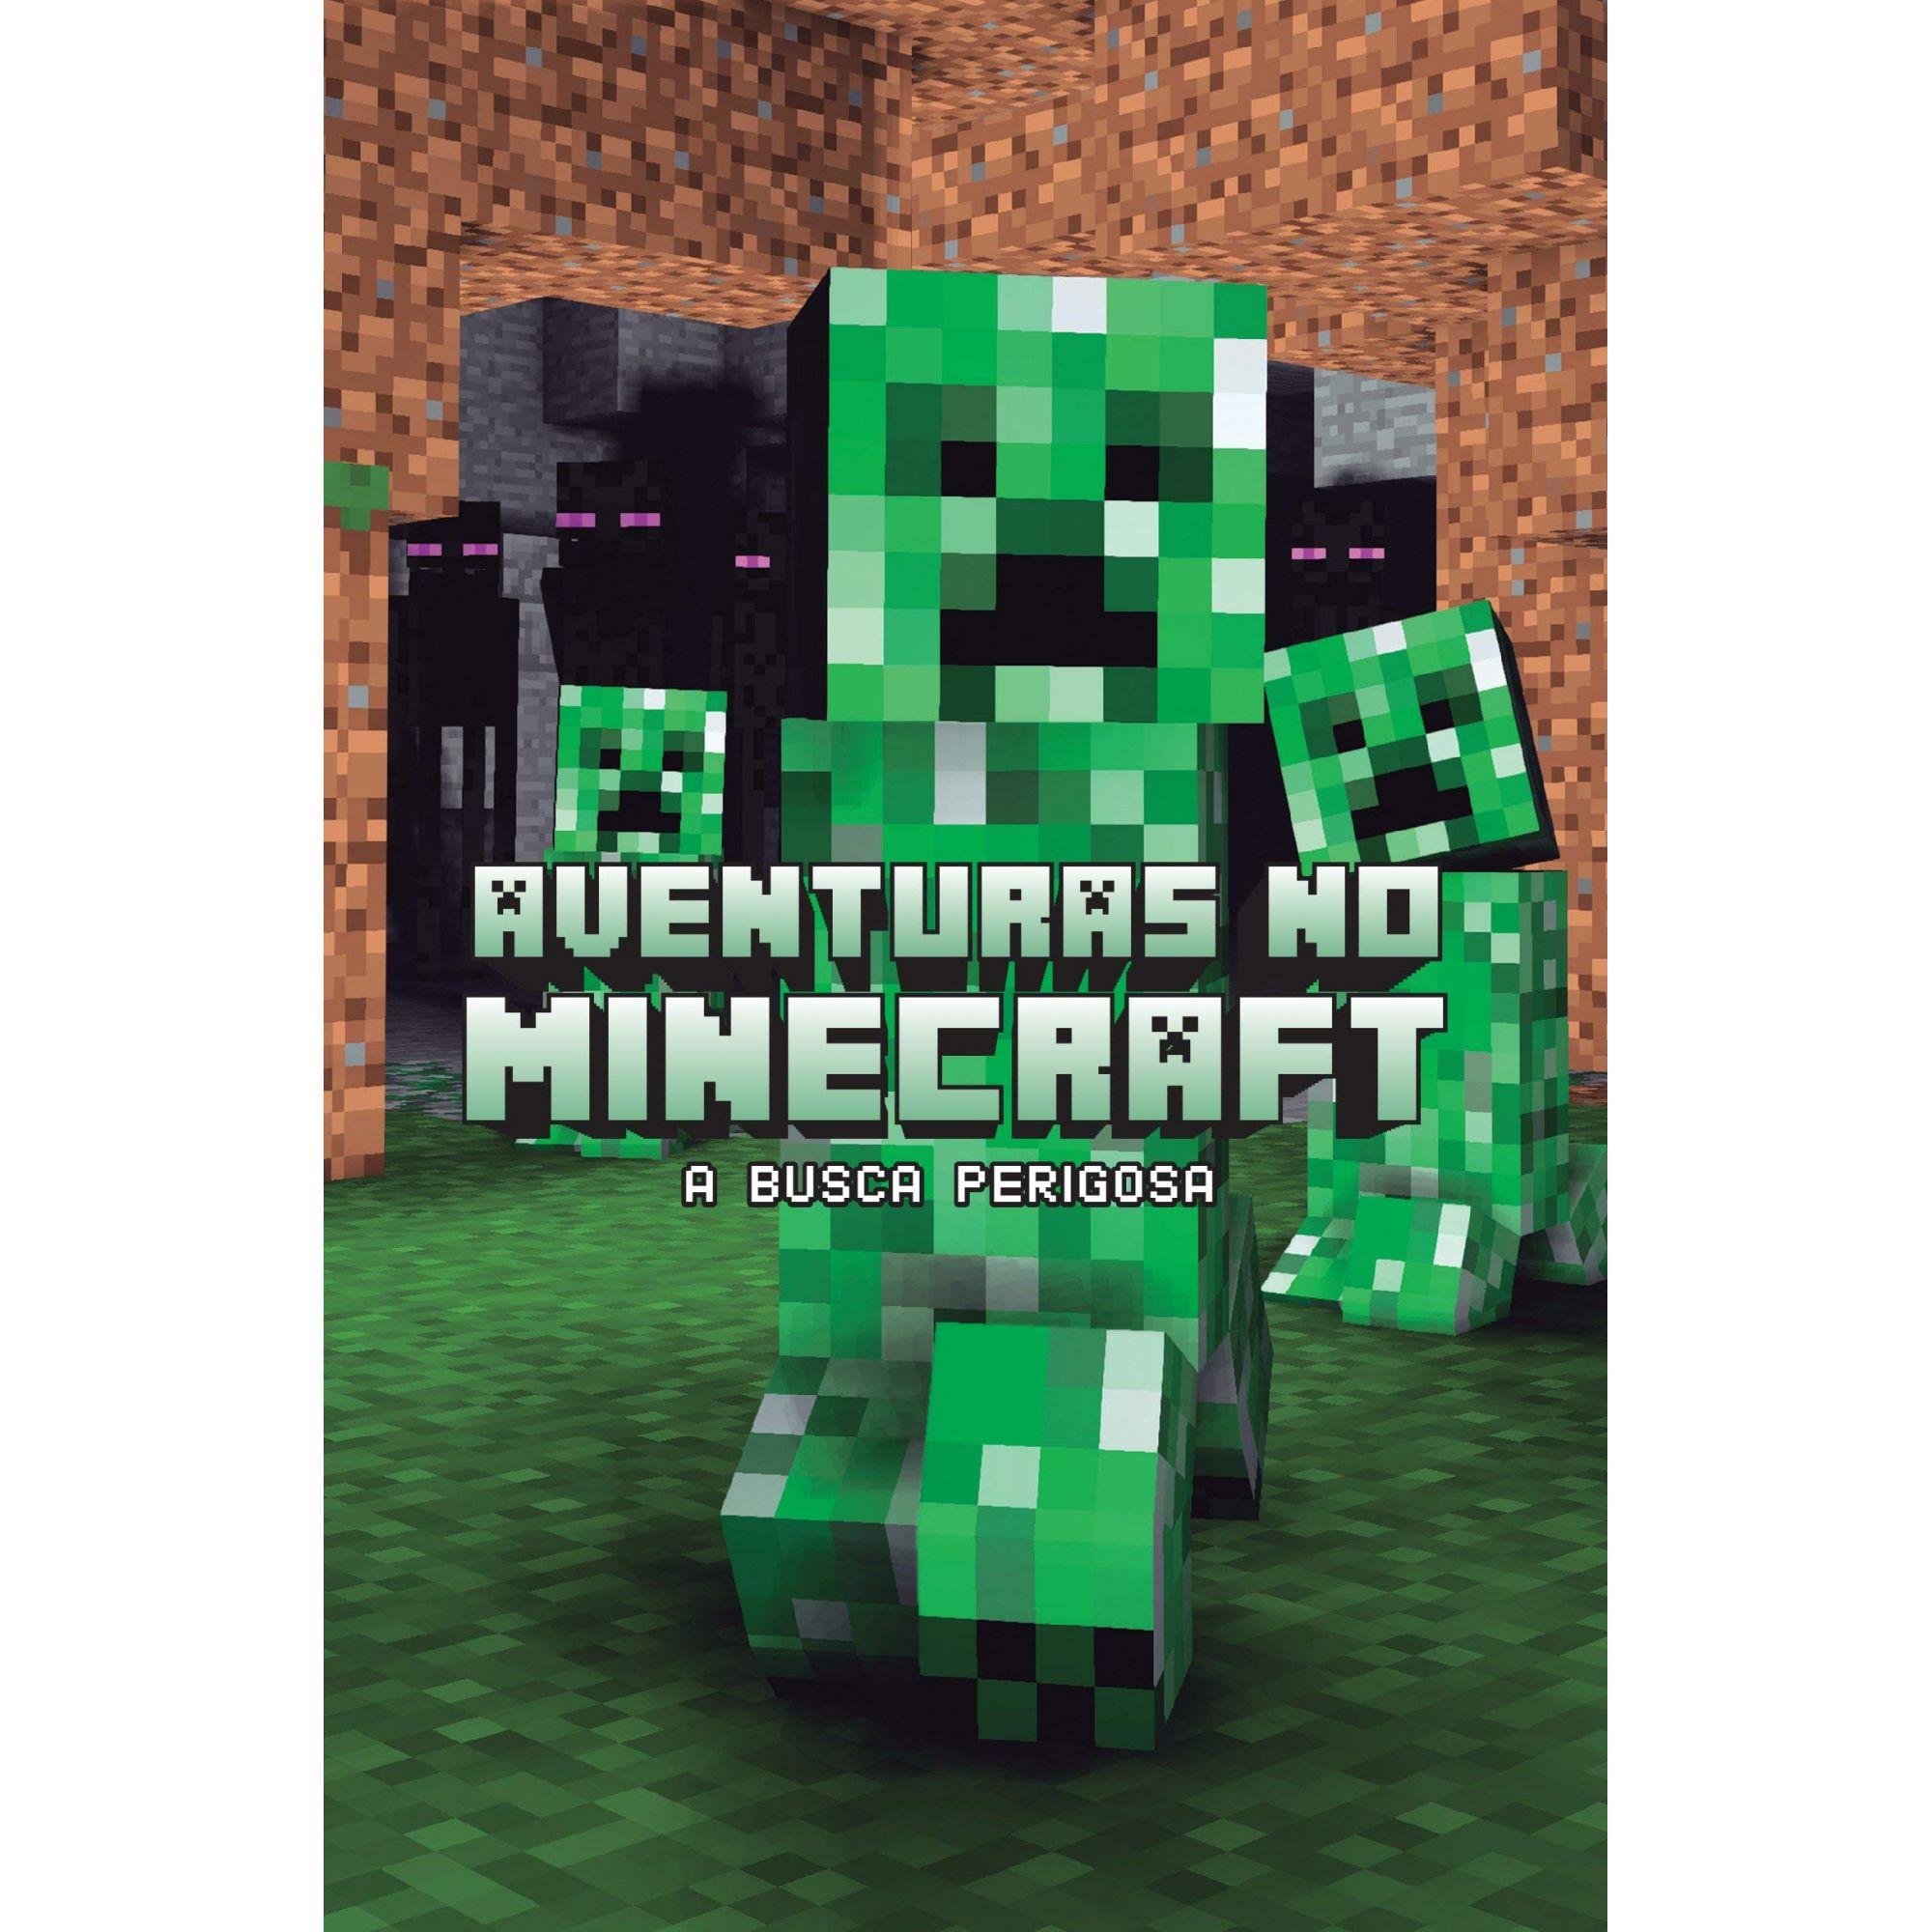 Aventuras no minecraft - Busca perigosa - livro 3: a Busca Perigosa: Volume 3